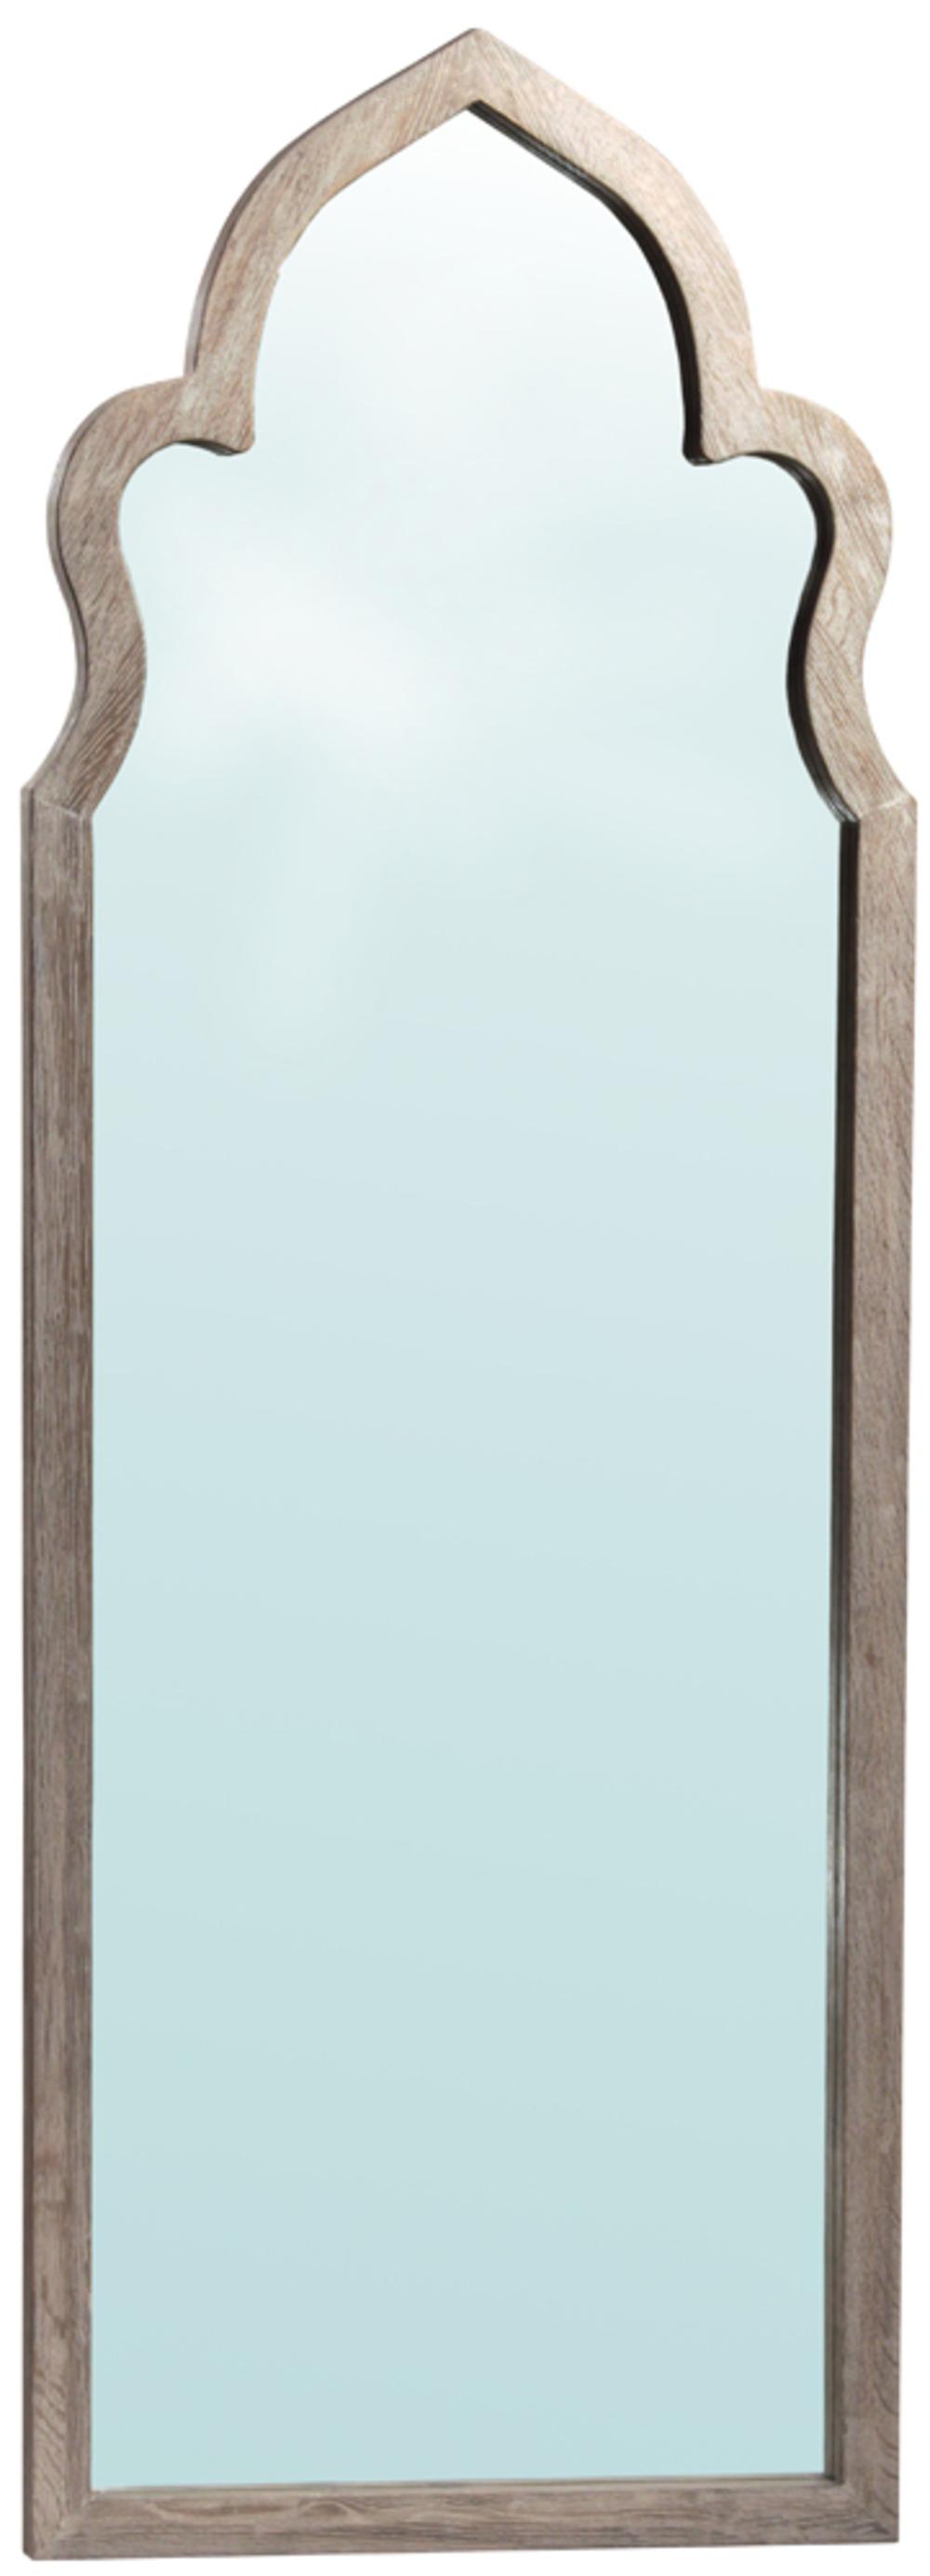 Dovetail Furniture - Maroc Floor Mirror